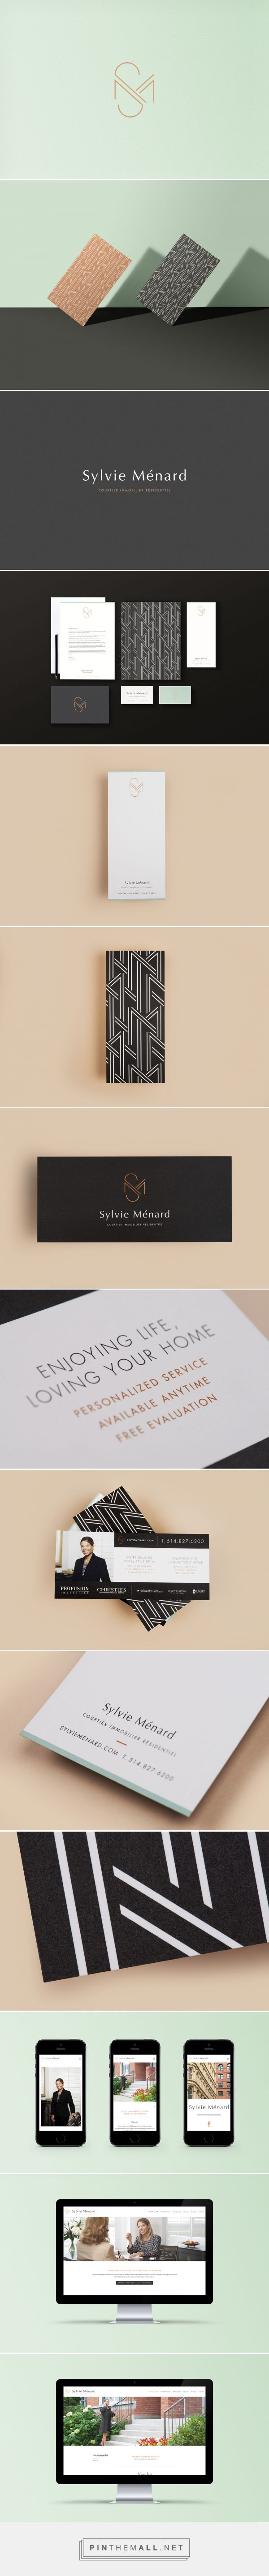 Sylvie Menard Premium Real Estate Broker by ByeBye Bambi | Fivestar Branding Agency – Design and Branding Agency & Curated Inspiration Gallery